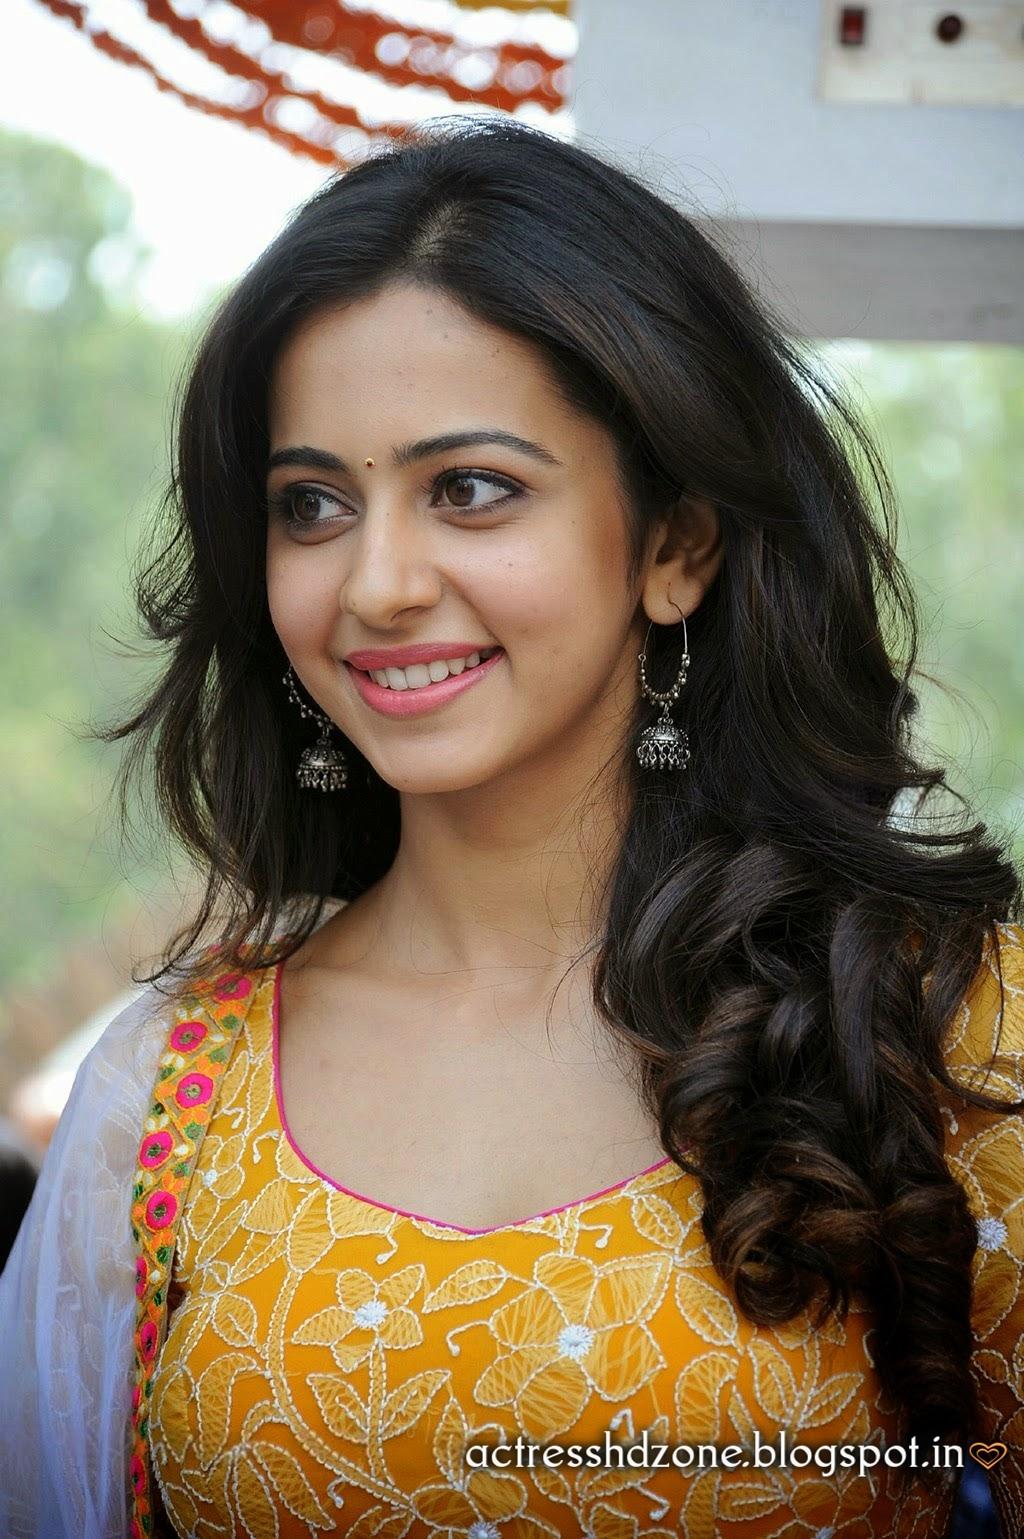 South Indian Actress Wallpapers In Hd Rakul Preet Sing Full Hd Wallpapers In Yellow Dress-5477